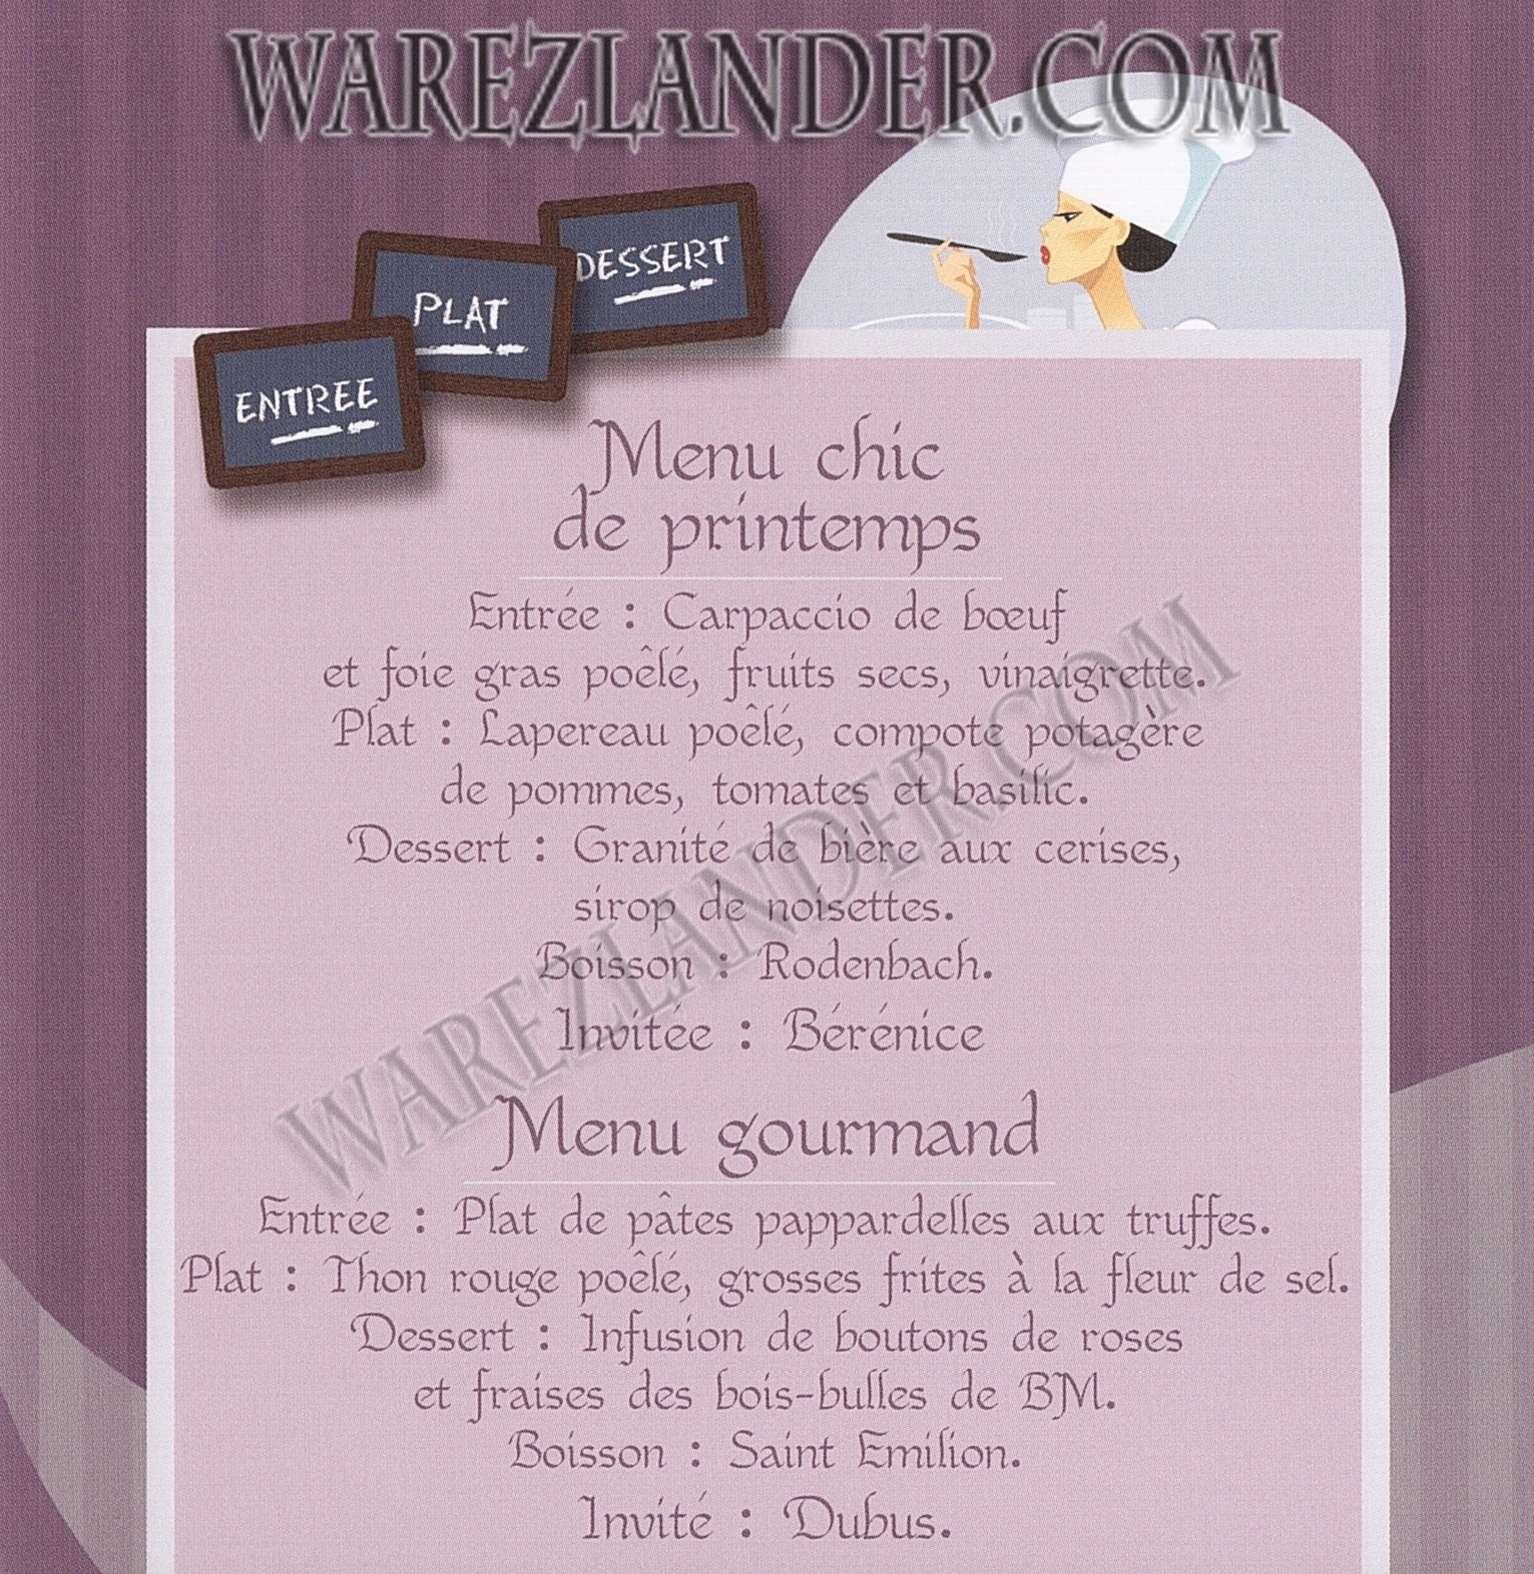 Id es de cuisine avec yves mattagne coffret 5 dvd warezlander - Idee menu printemps ...